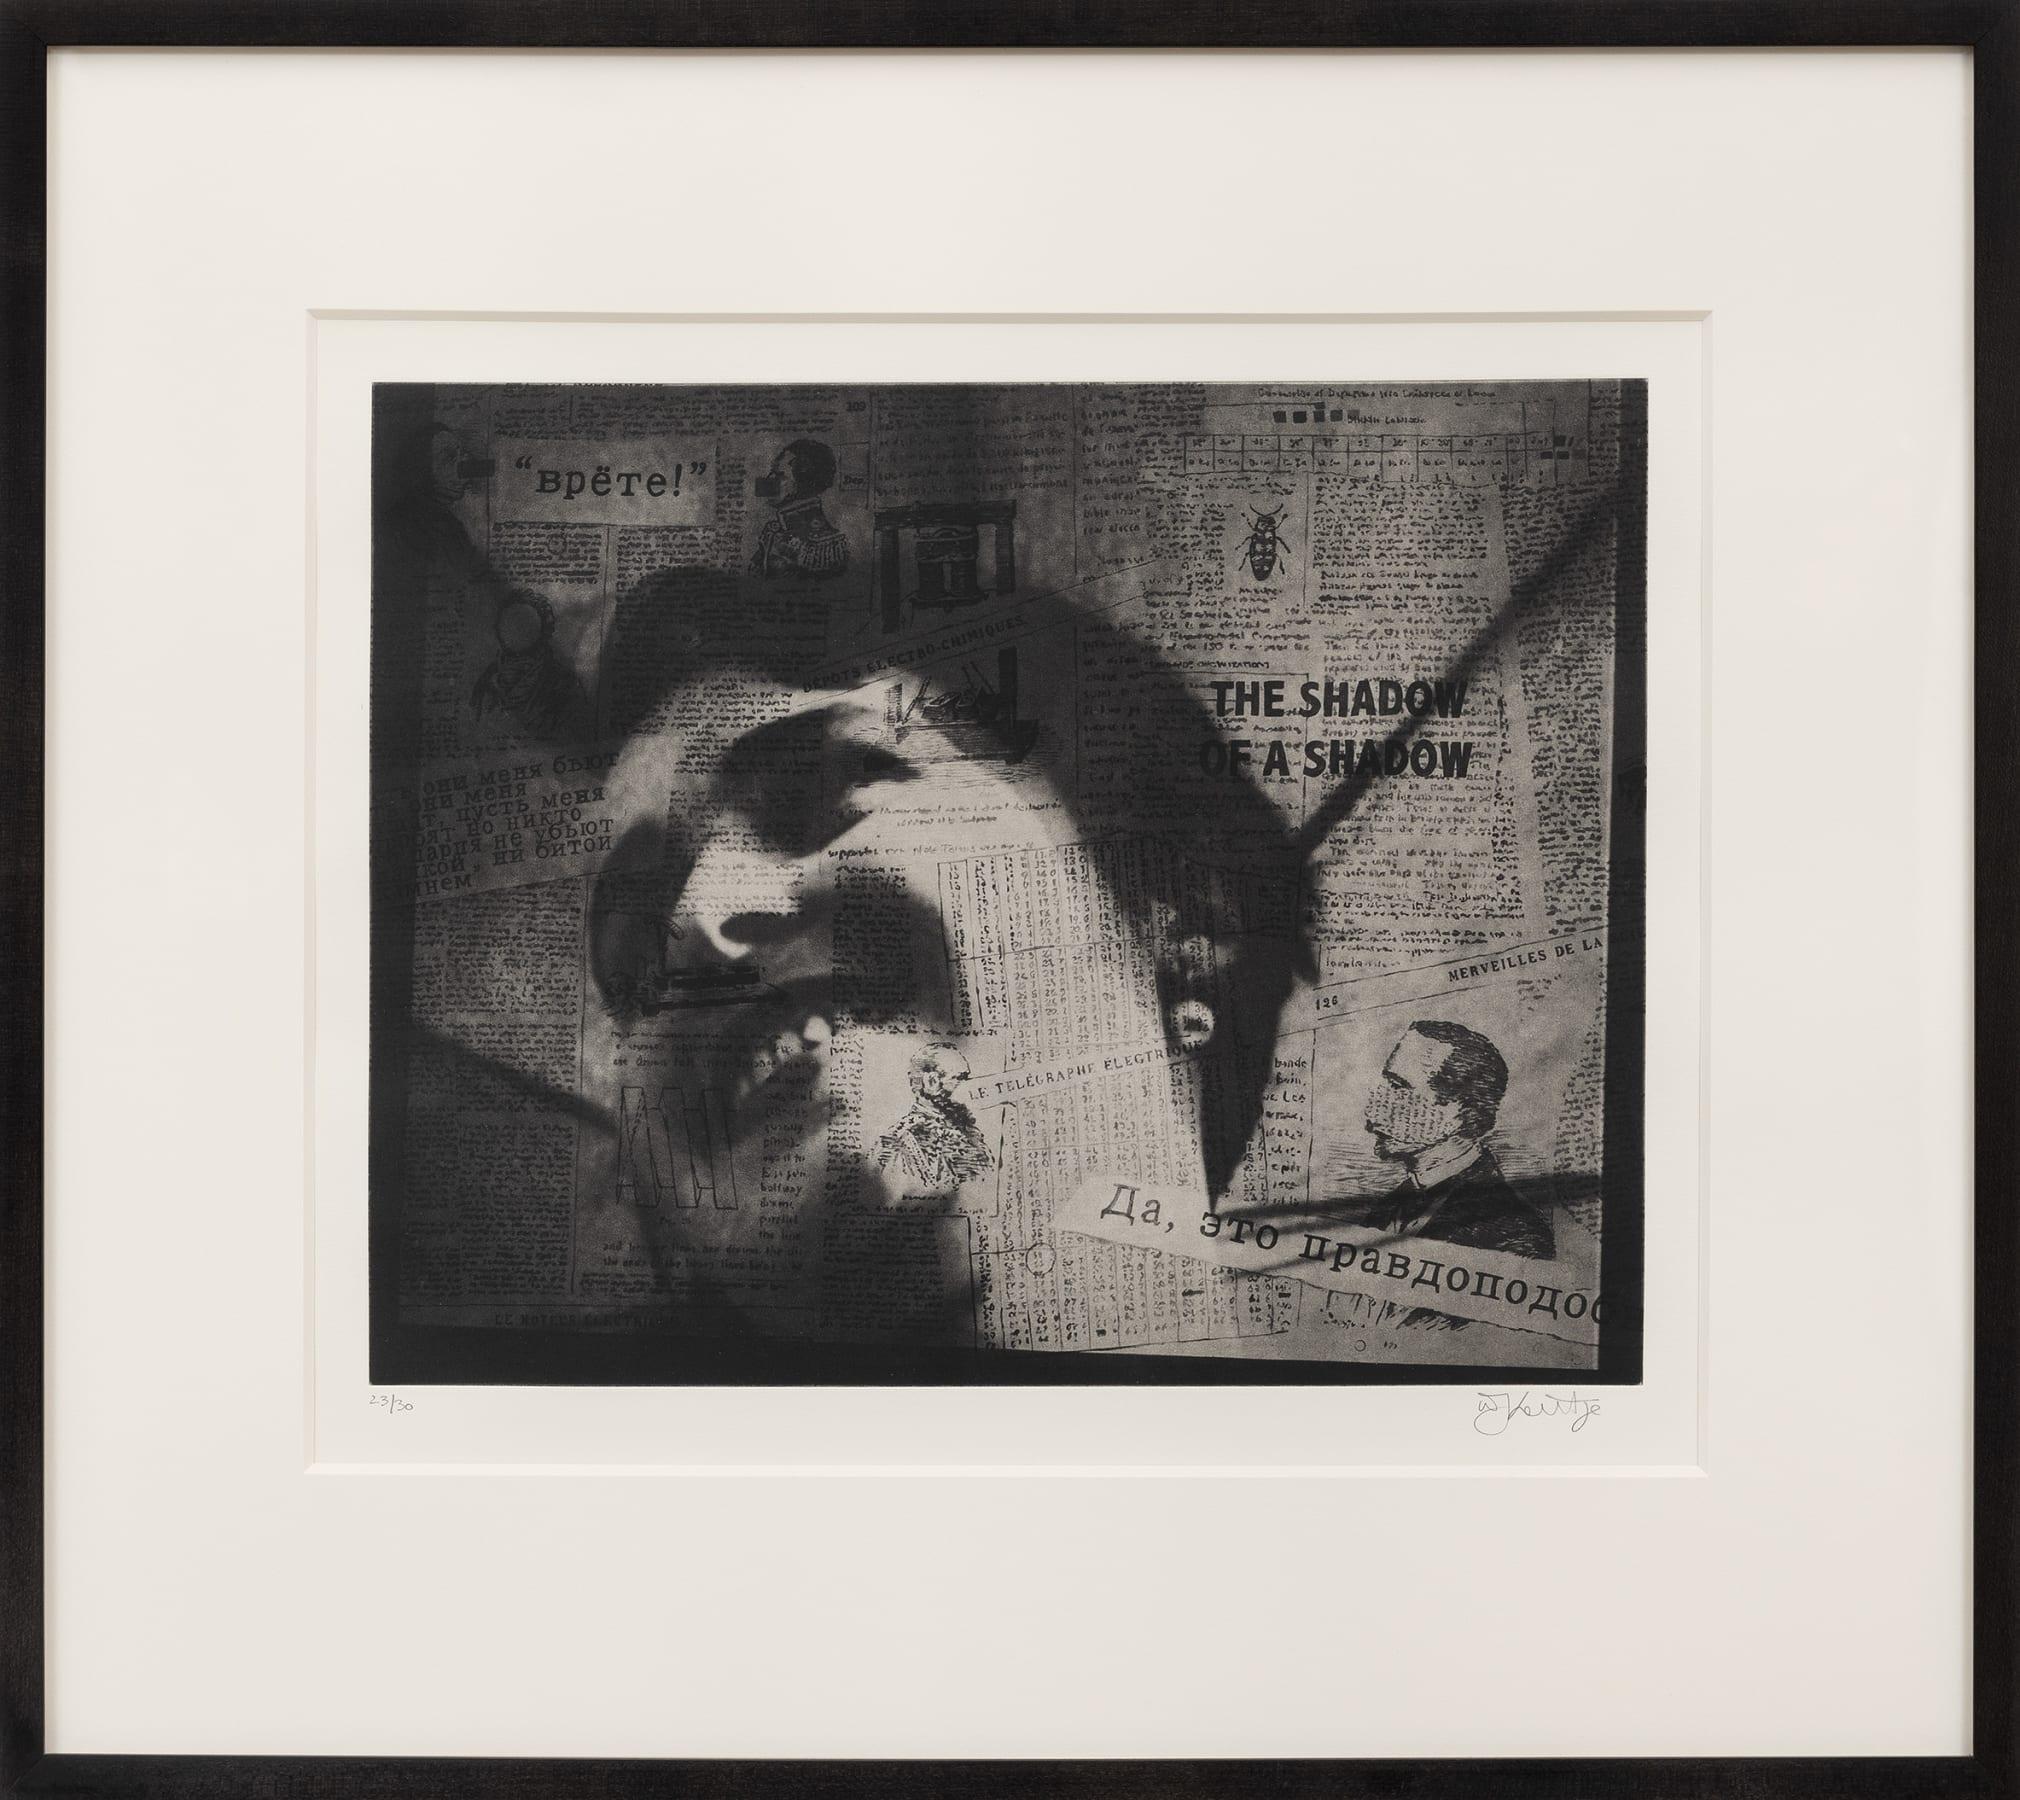 William Kentridge, The Shadow of a Shadow, 2010